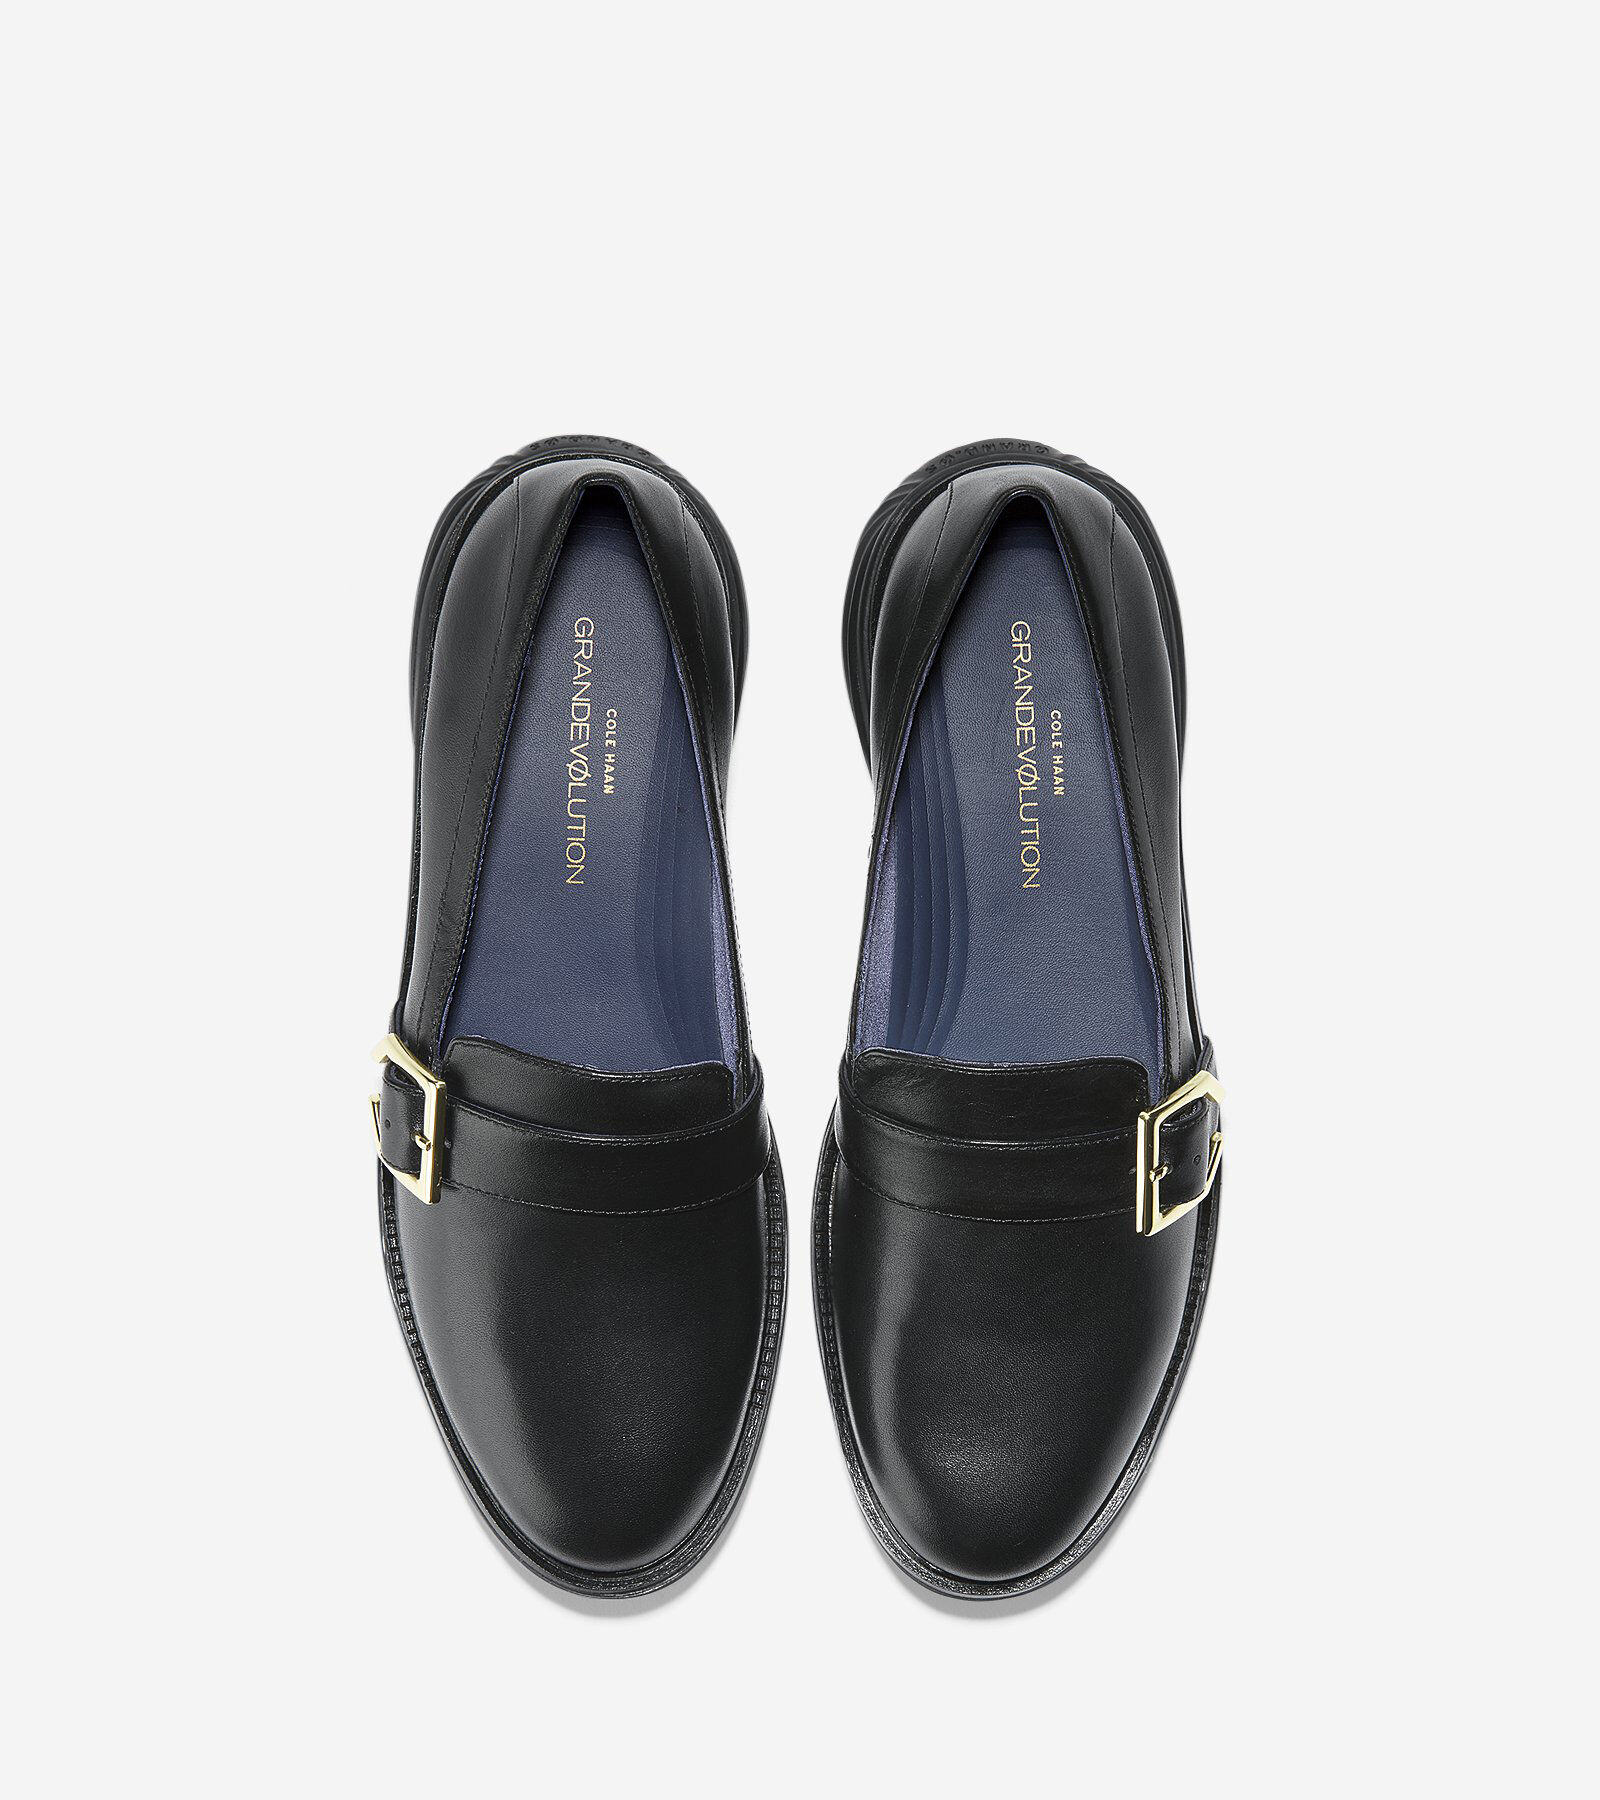 ... Women's GrandEvølution Loafer · Women's GrandEvølution Loafer · Women's  GrandEvølution Loafer; Women's GrandEvølution Loafer. #colehaan